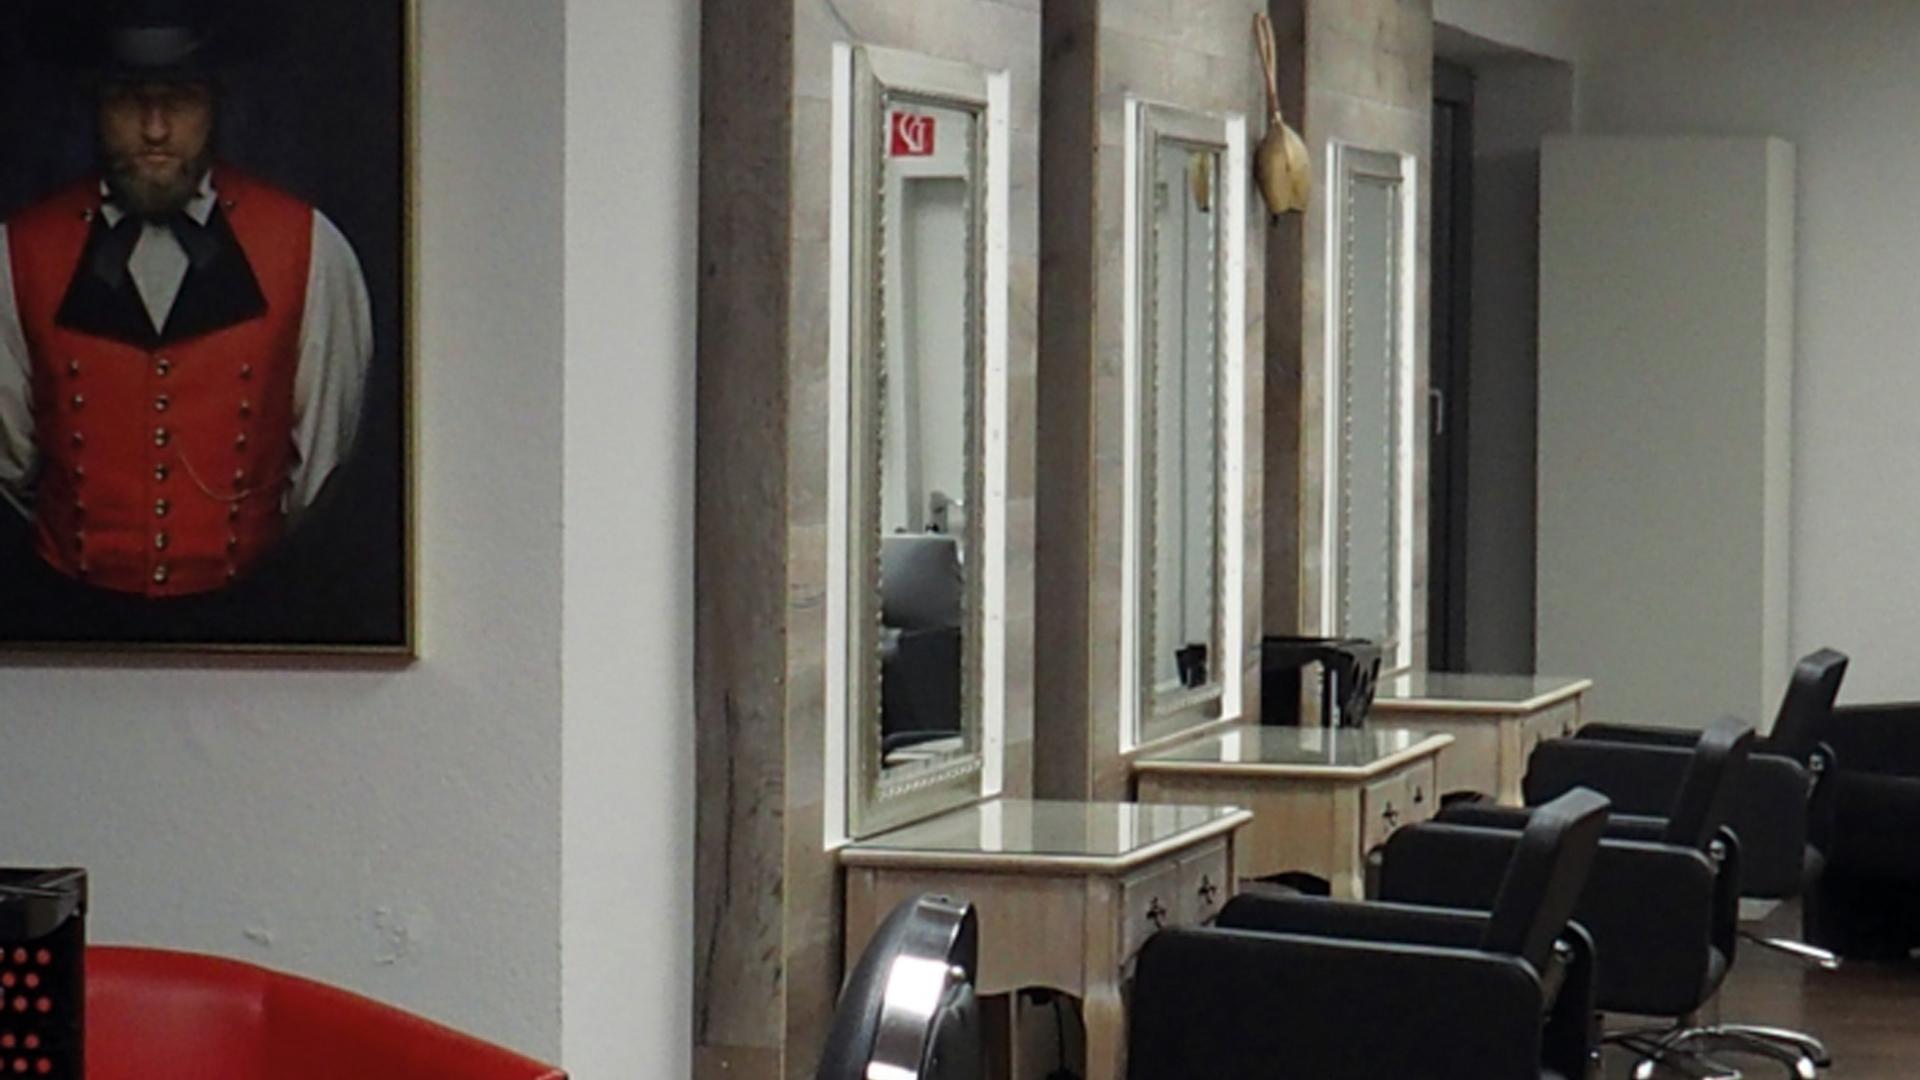 Friseur Herrenstrasse Loerrach